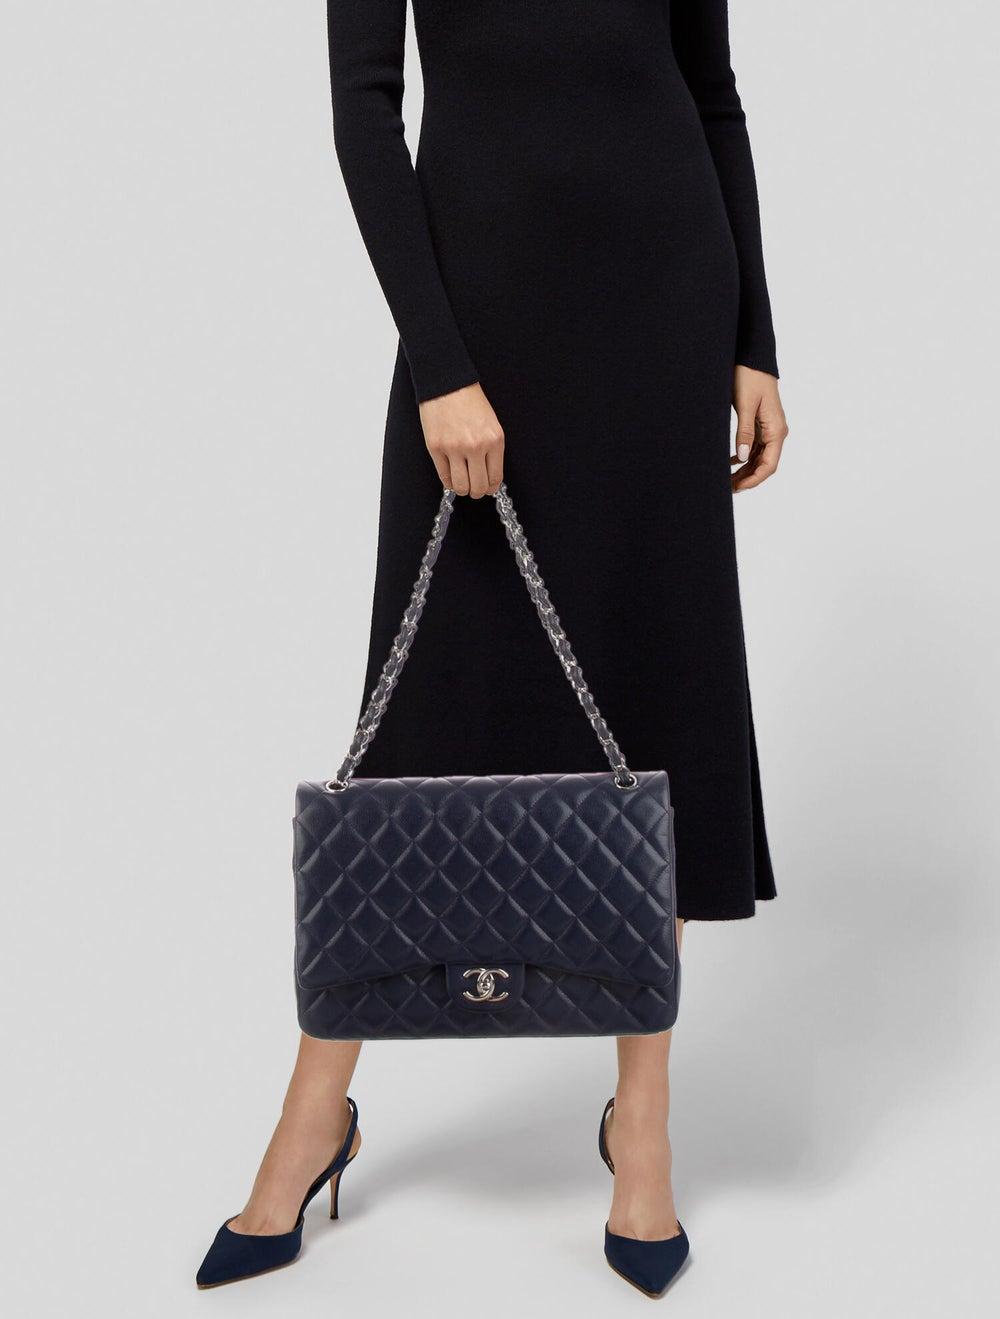 Chanel Classic Maxi Double Flap Bag Blue - image 2